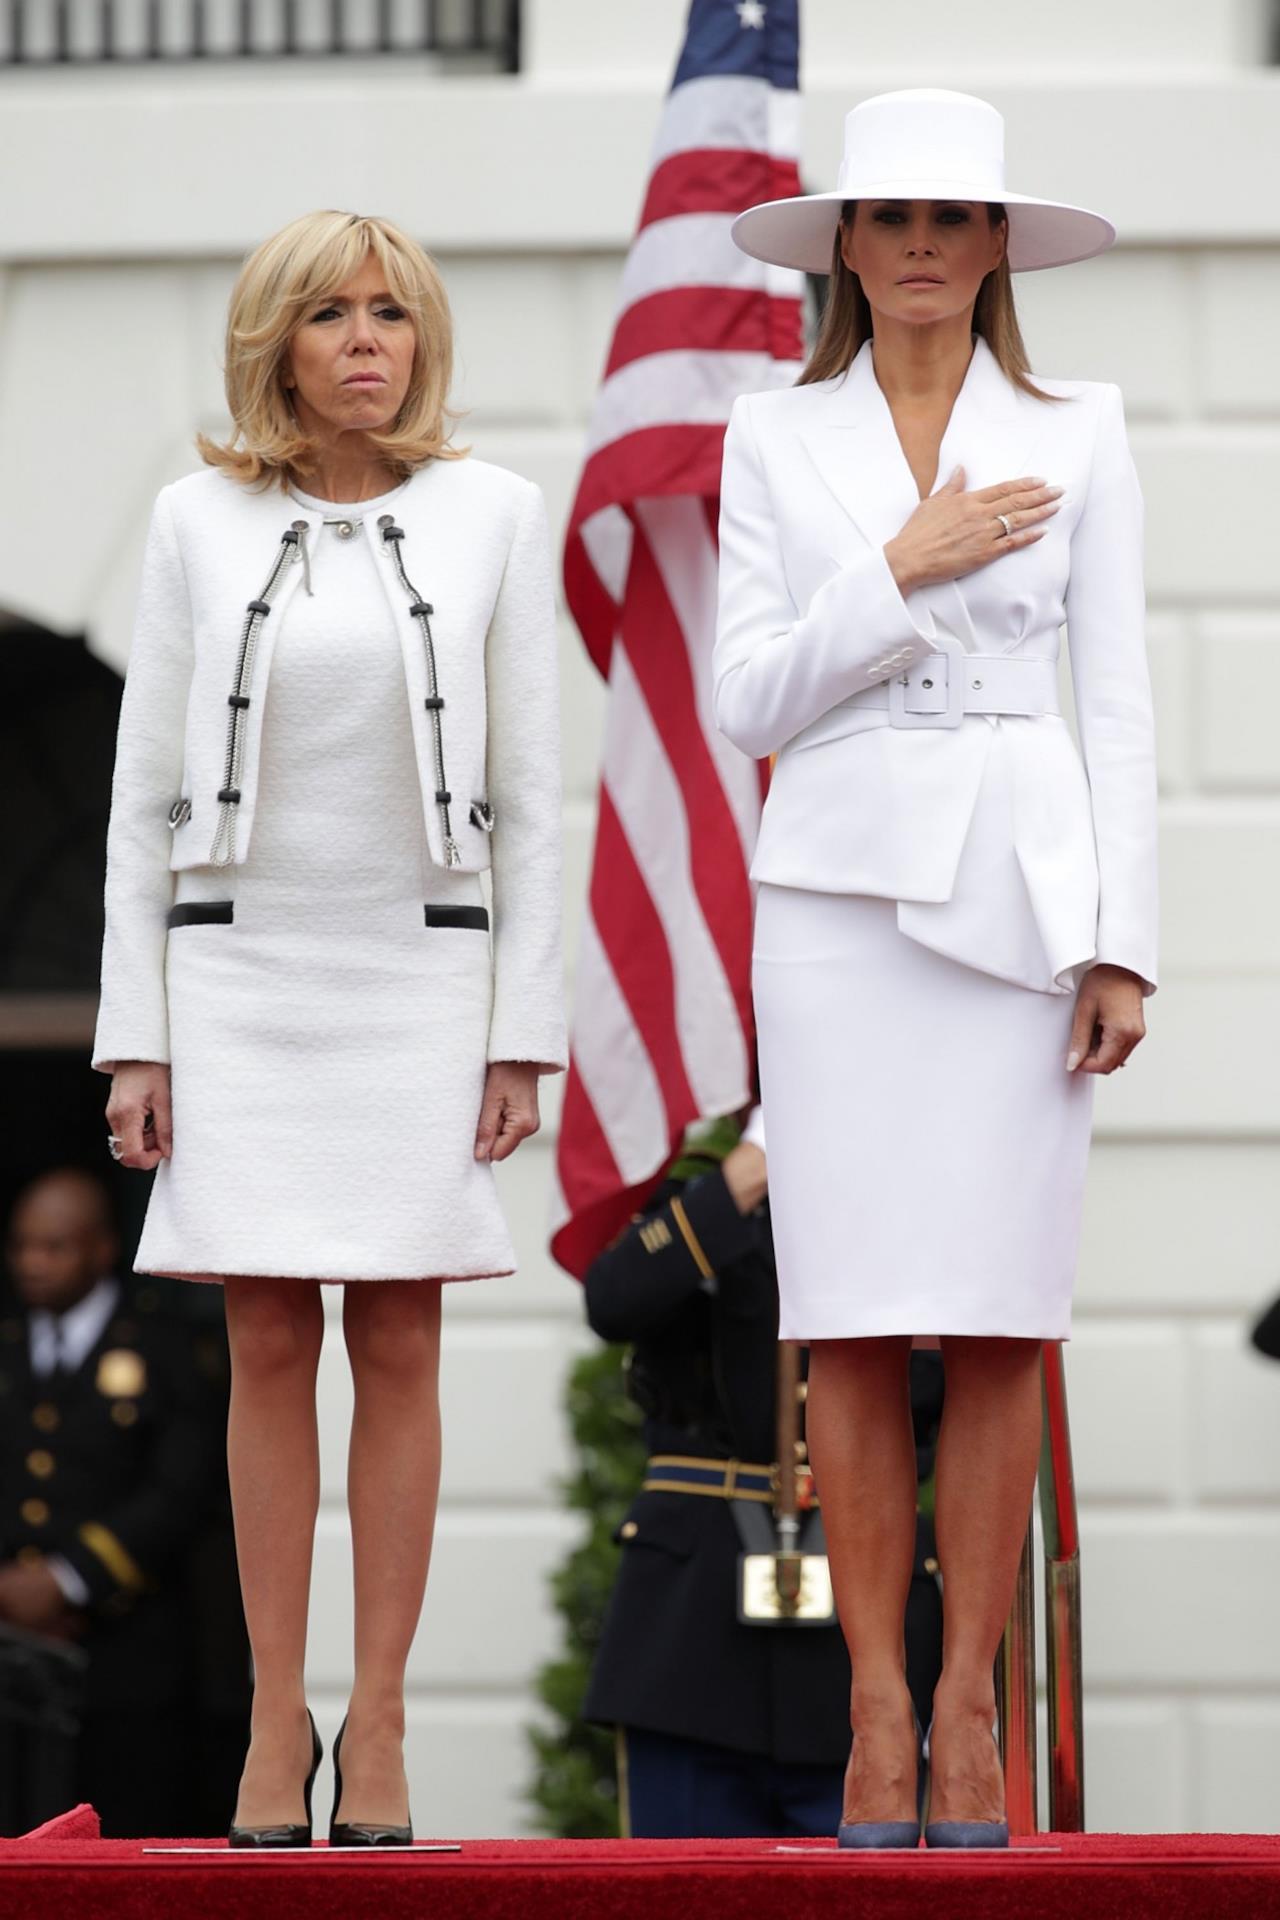 scandal melania trump copia il look di olivia pope